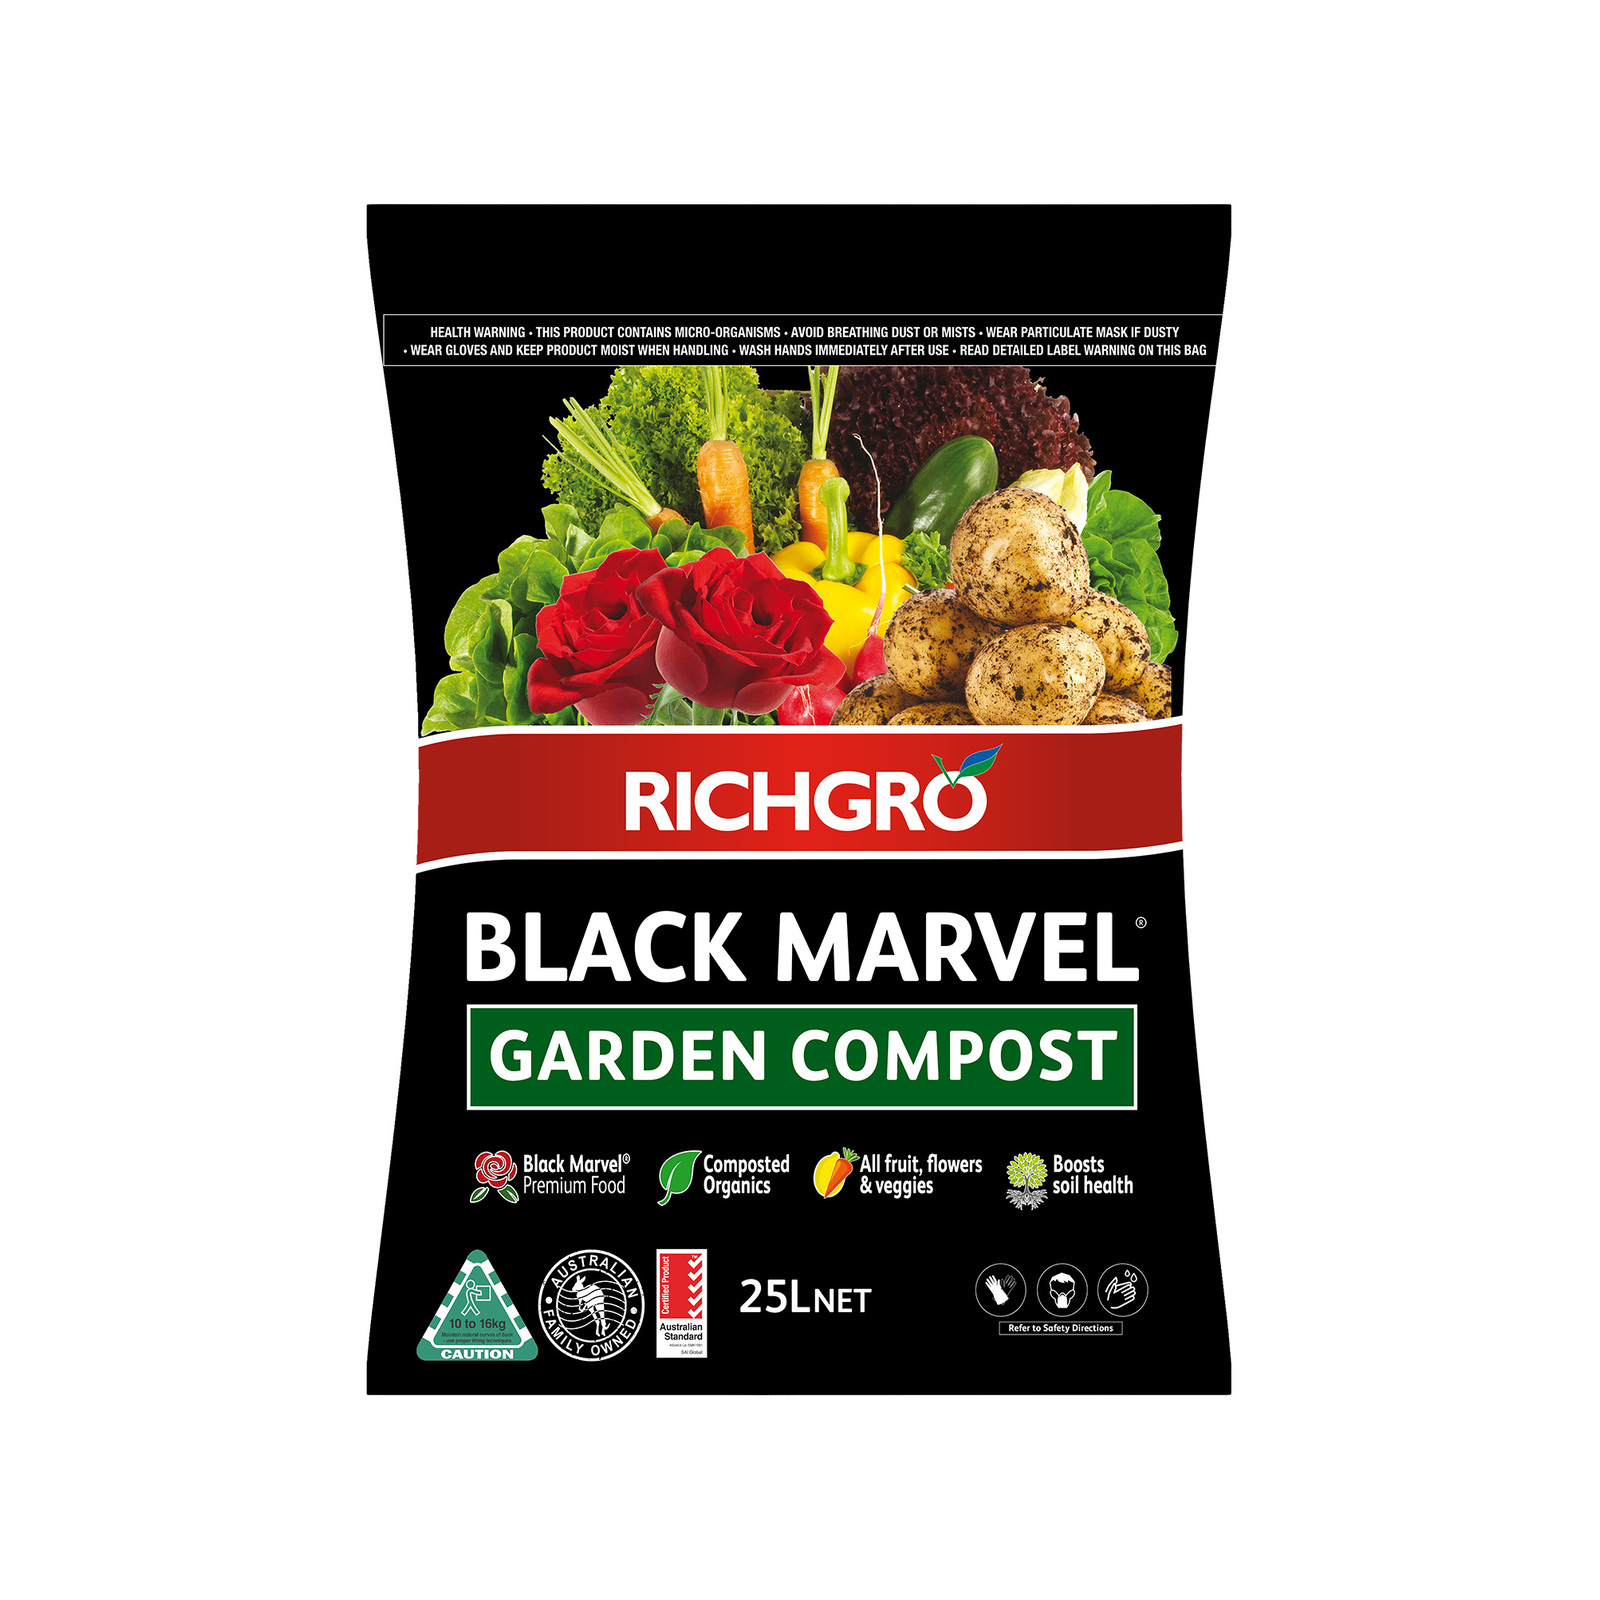 Richgro 25L Black Marvel Garden Compost